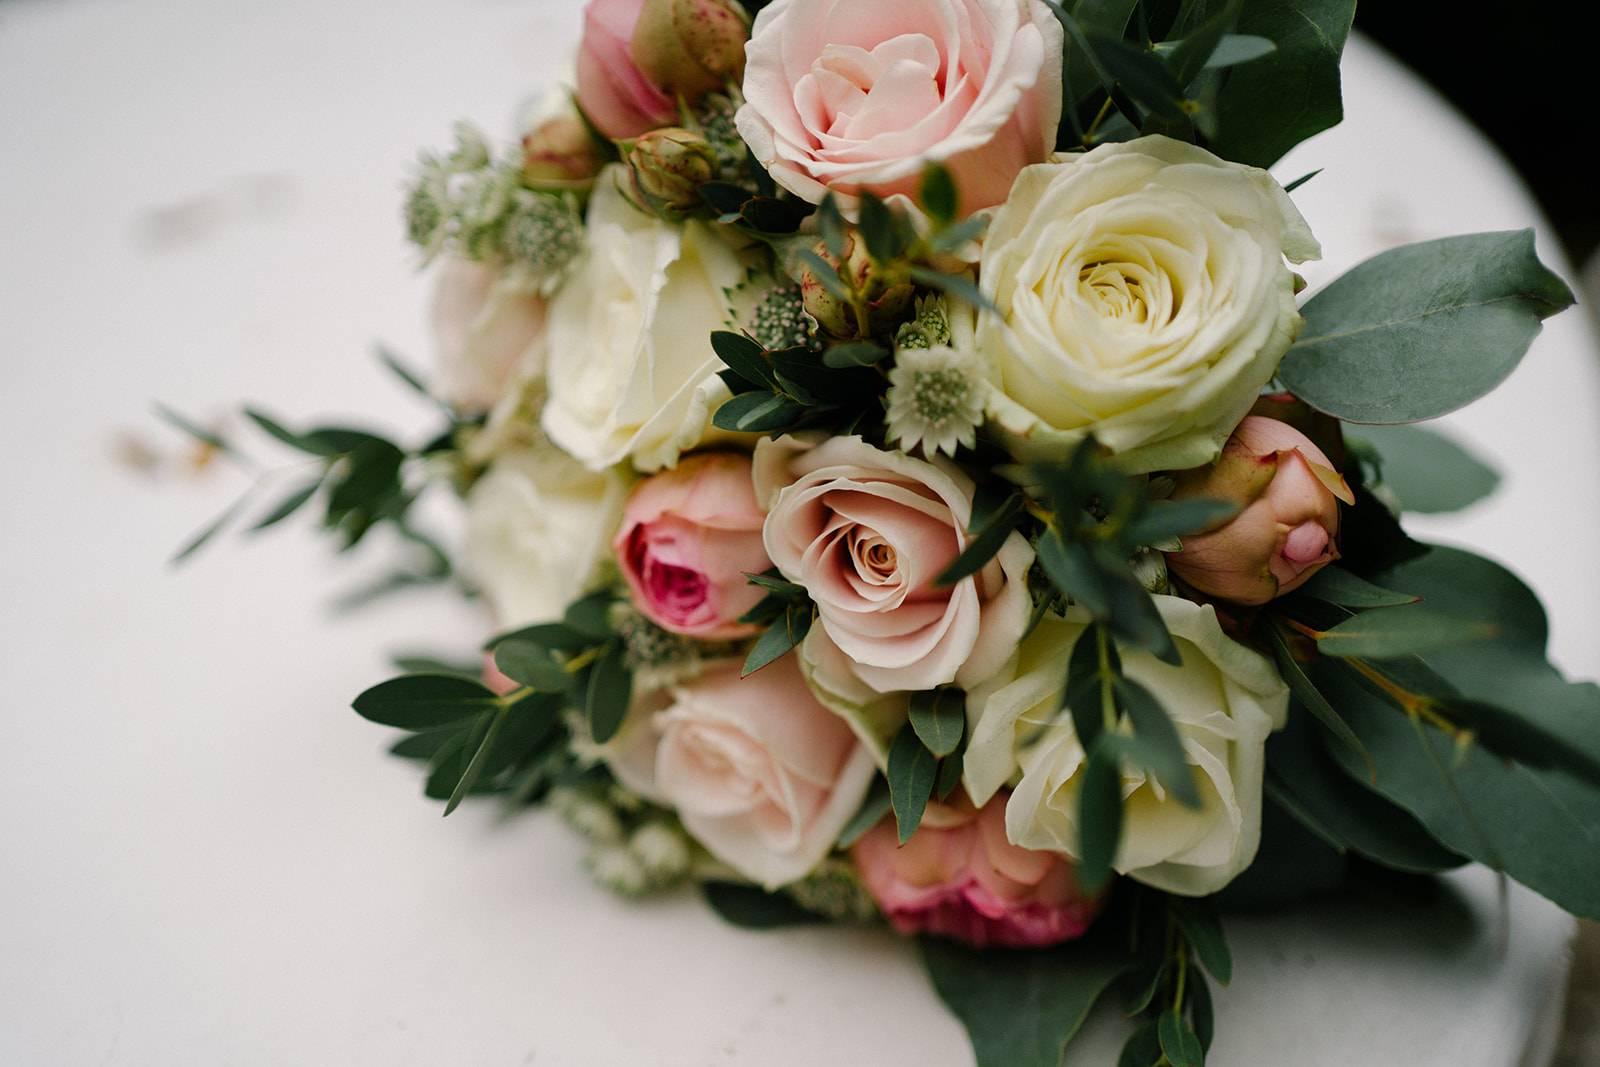 Hilde Eyckmans - PAB-4 - House of Weddings